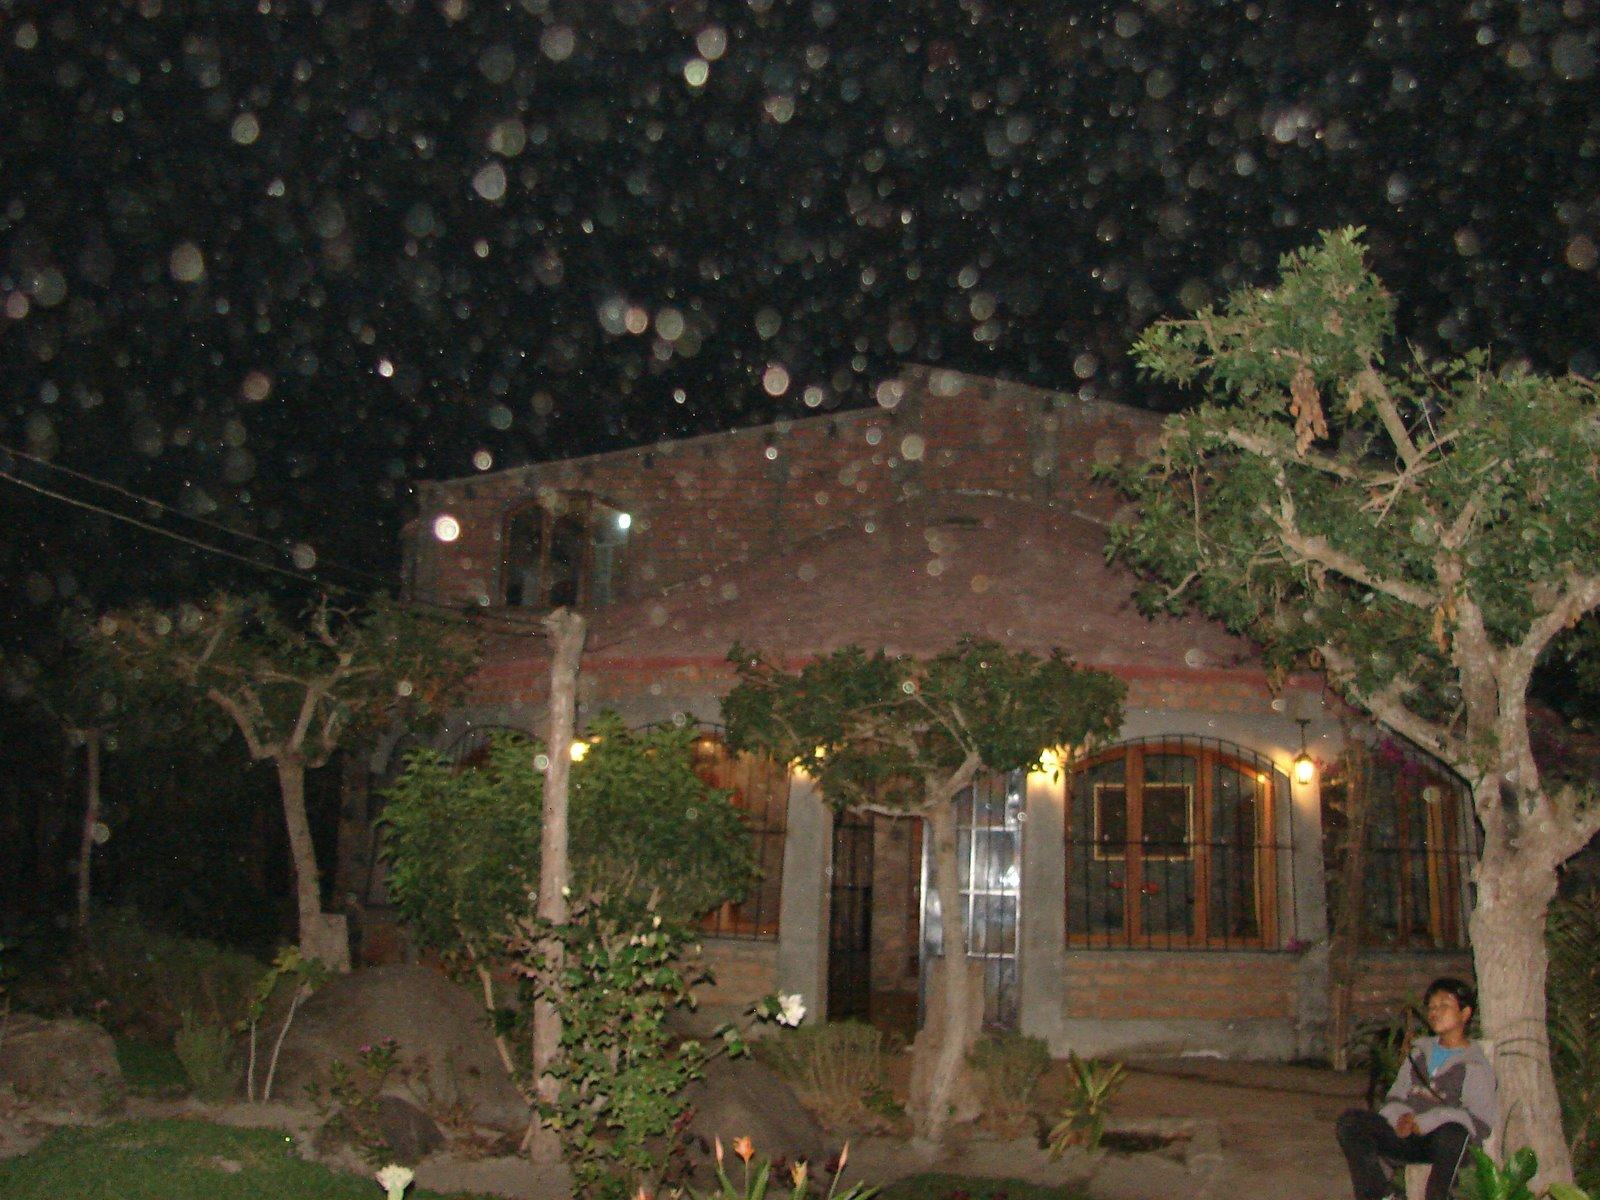 URGENTE-24-marzo-25-26-27...2011  ovnis saliendo,de la LUNA SEC ESPECTACULAR  -Huacho-hoy 2:33 am